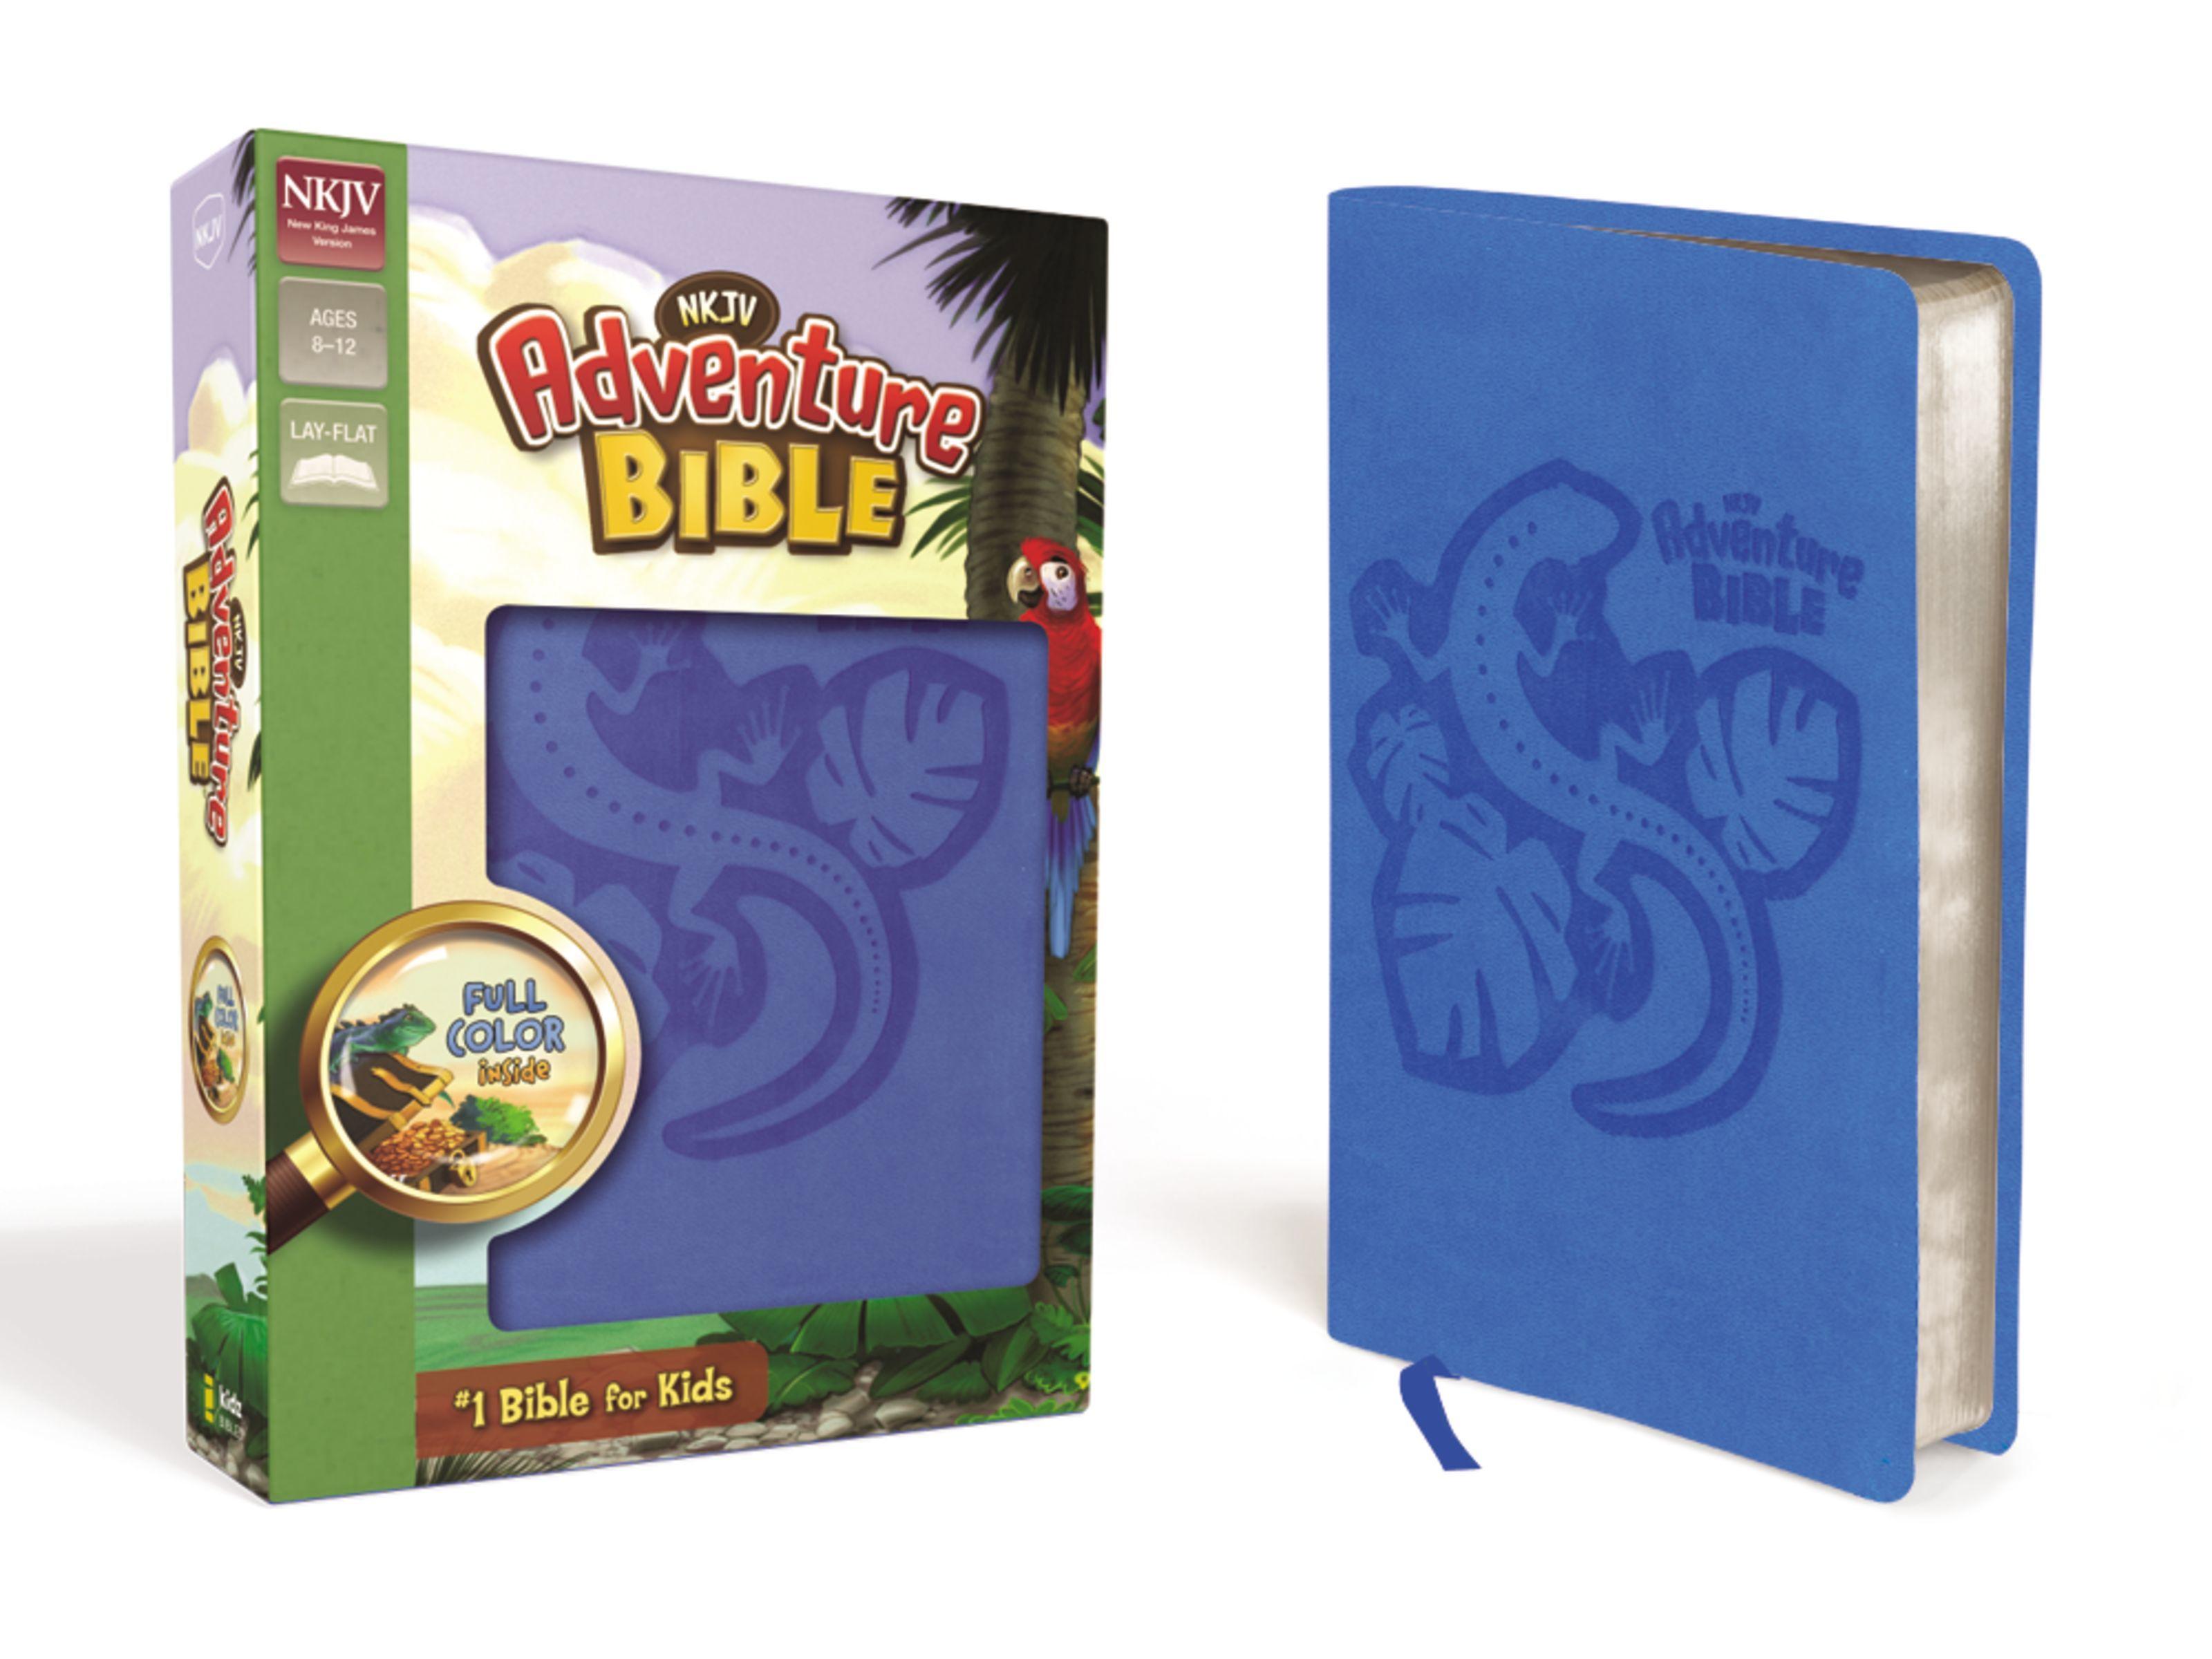 NKJV Adventure Bible- Blue Lizard